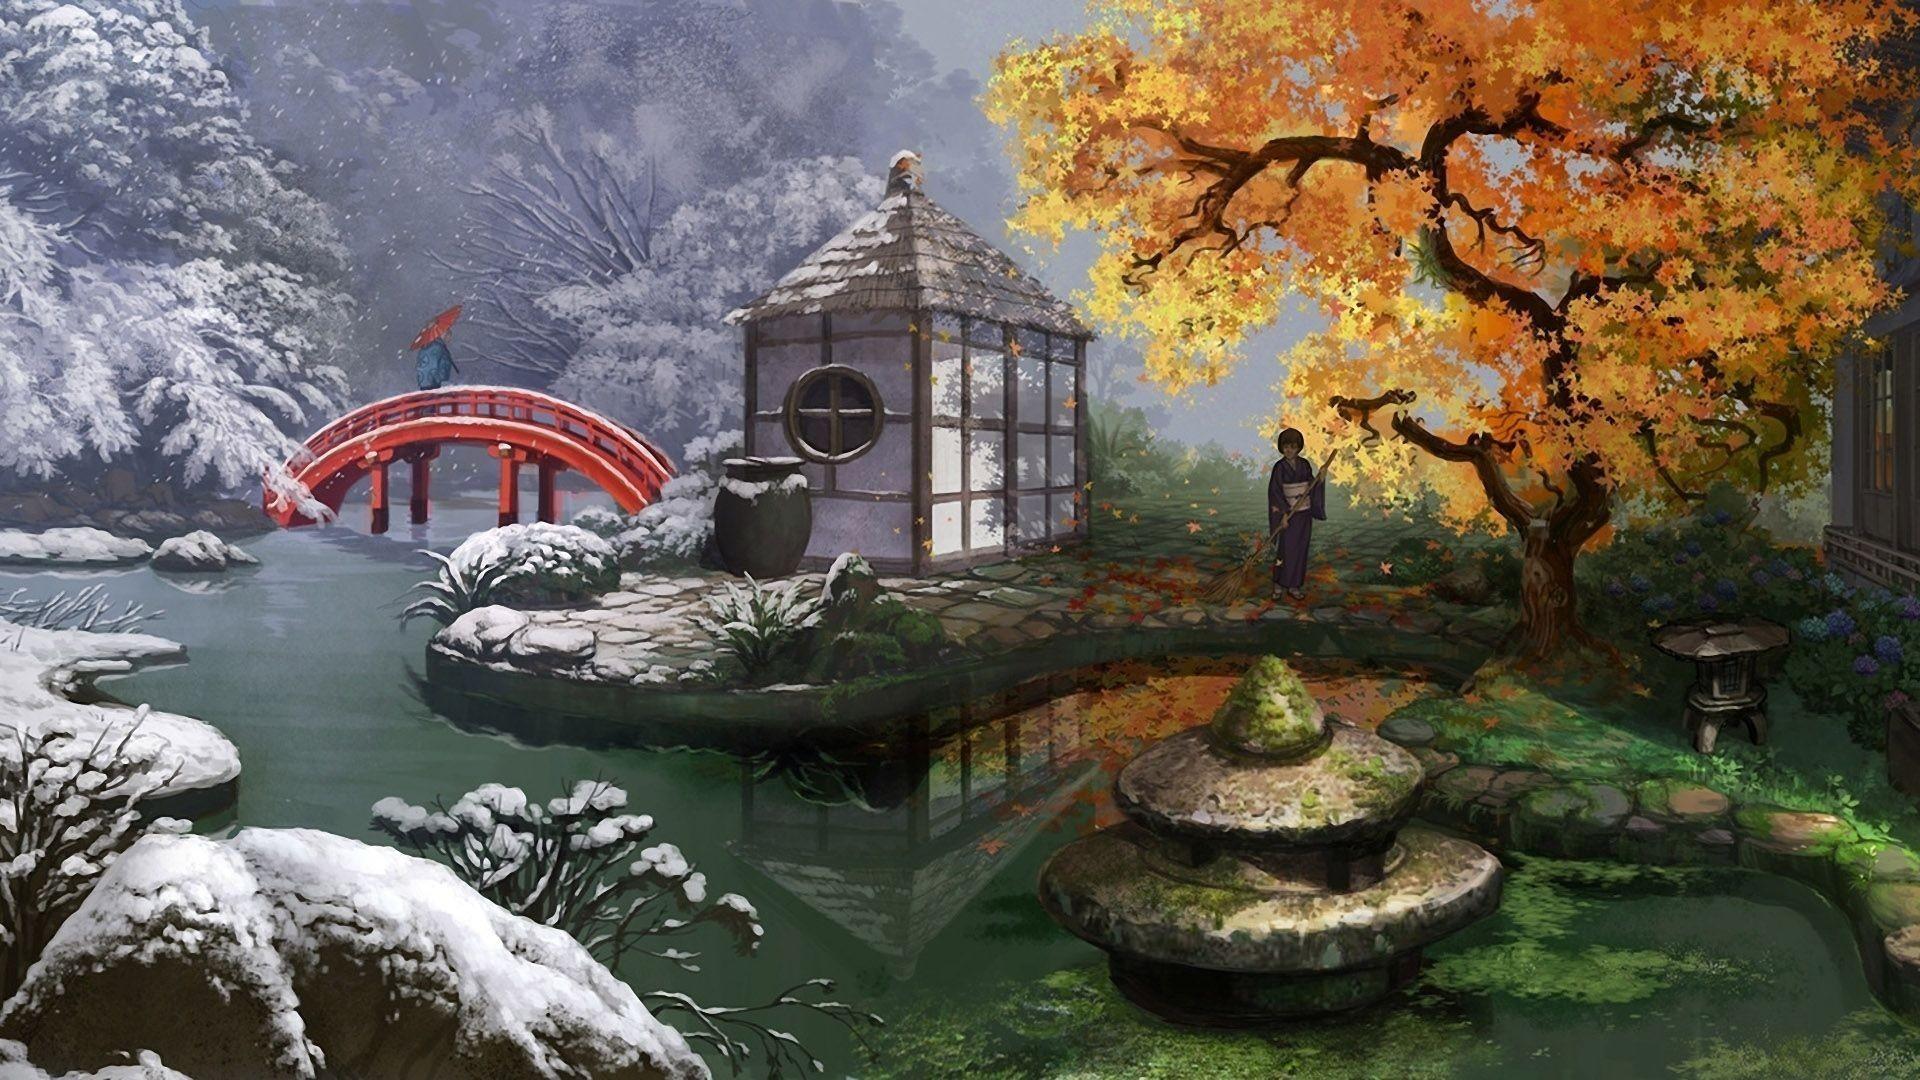 Hd Japan Wallpapers 1080p: Japanese Garden Wallpaper (59+ Images